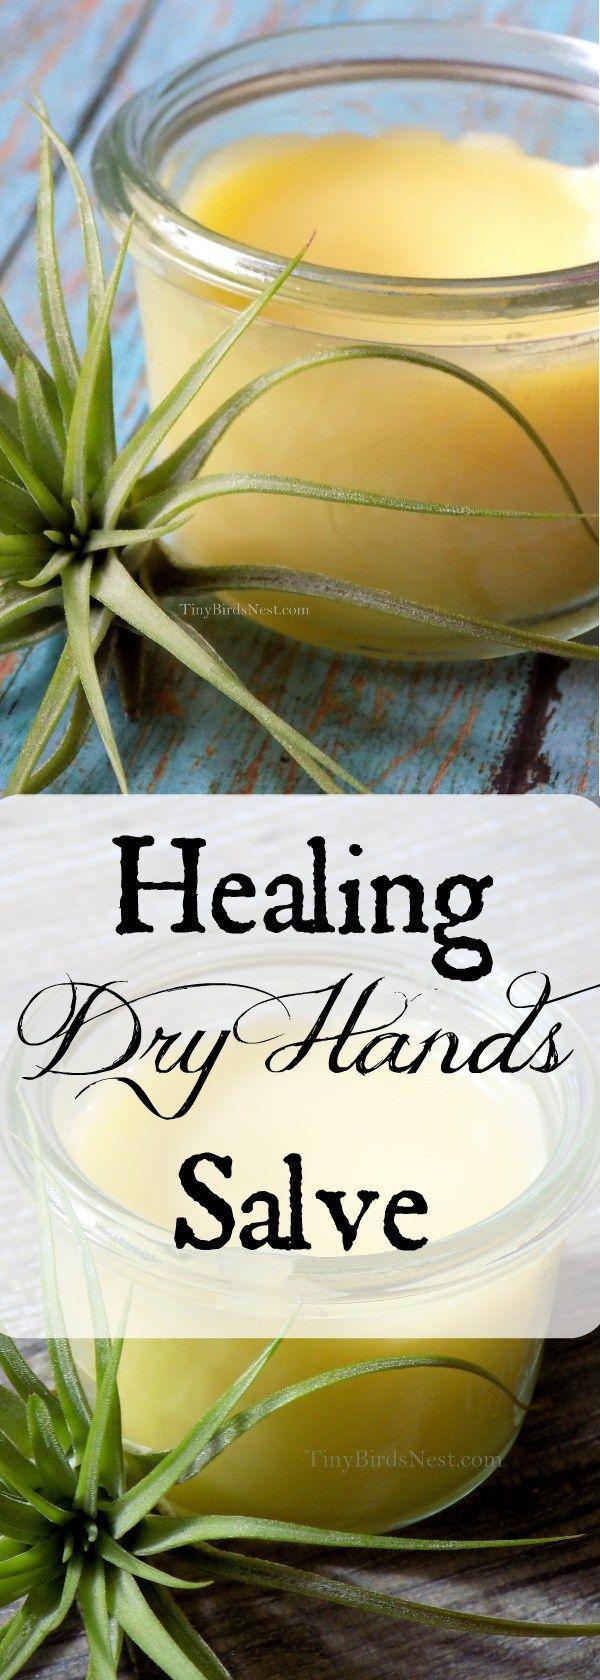 Healing Dry Skin Remedy Salve  Soaps u Salves  Pinterest  Dry